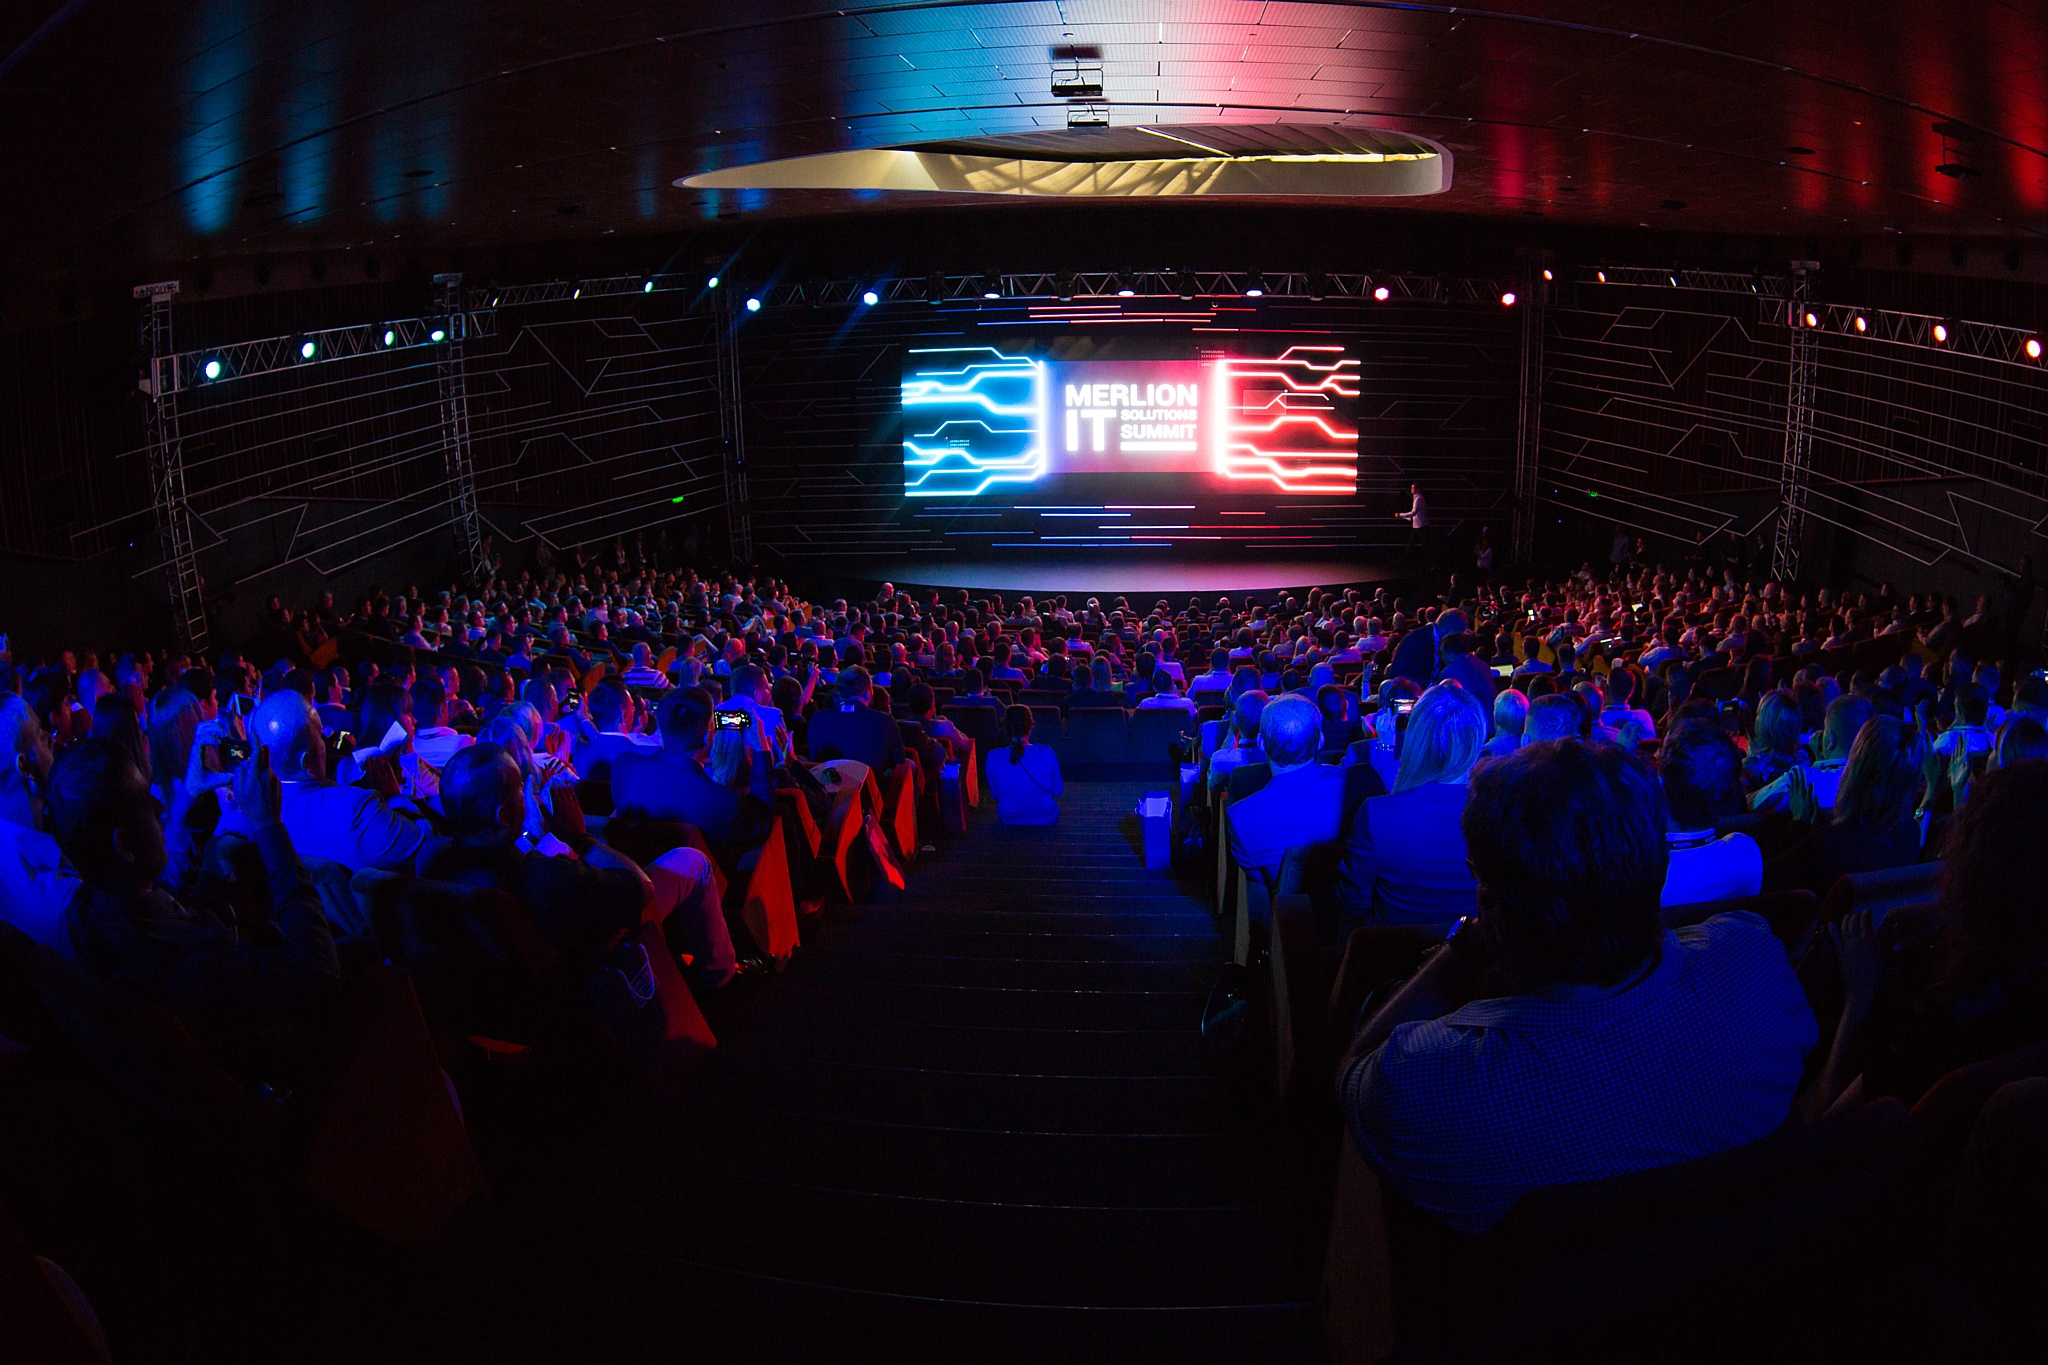 Merlion IT Solutions Summit соберет более 1500 участников